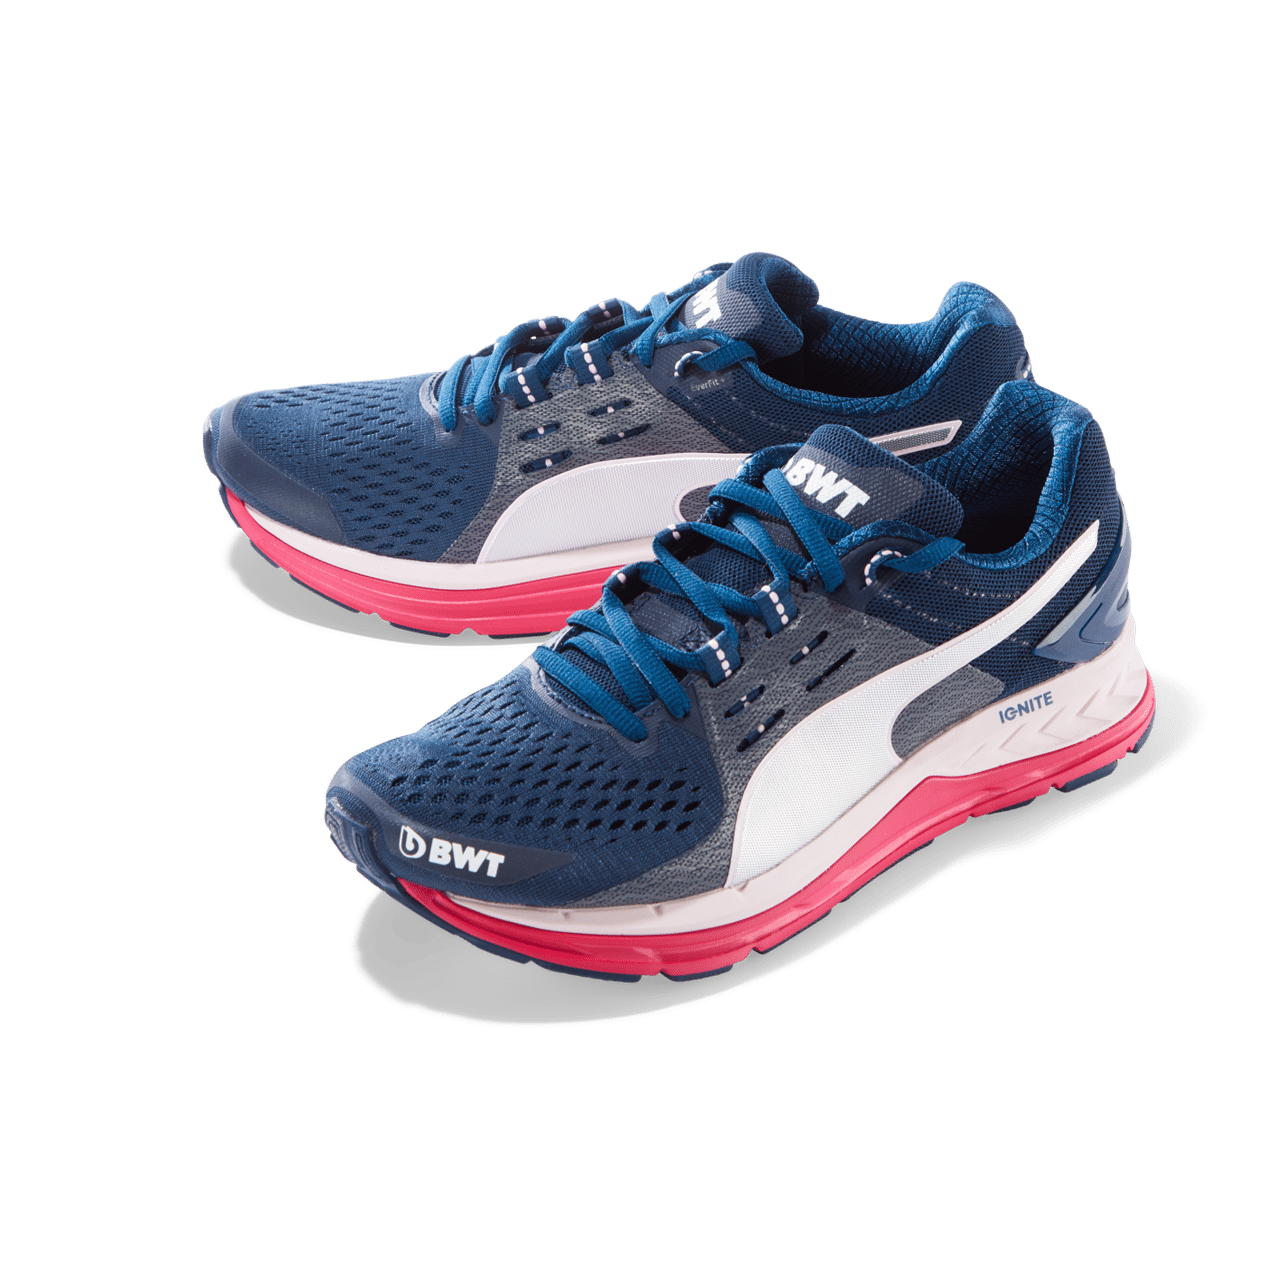 BWT Schuhe Puma Herren Gr. 46 BWT